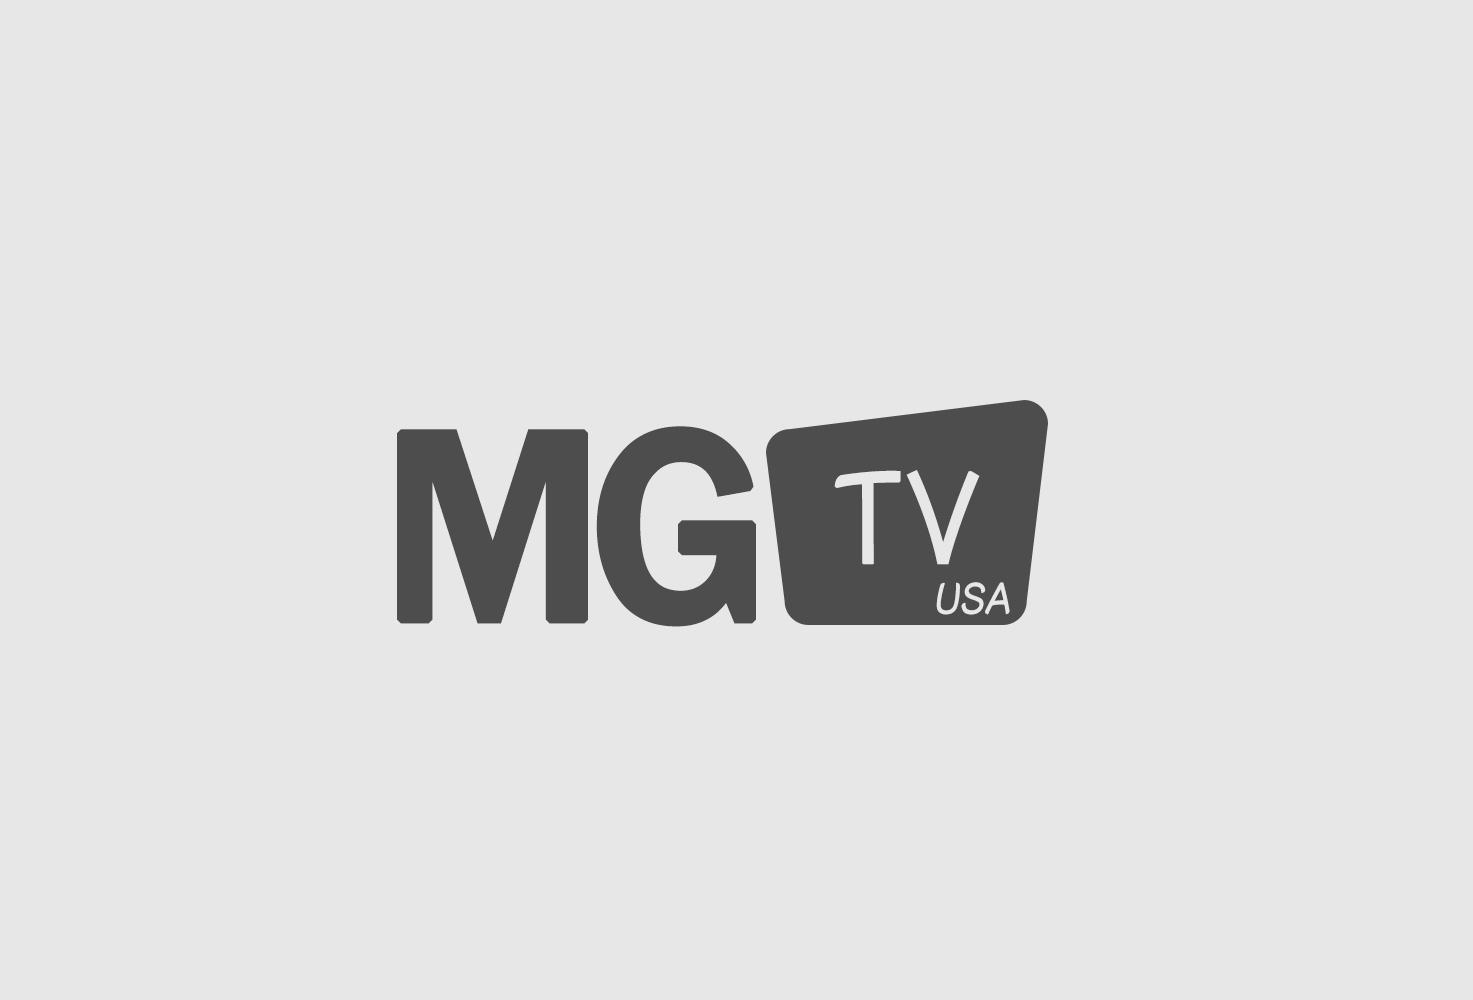 mgtvusa-logo-BW